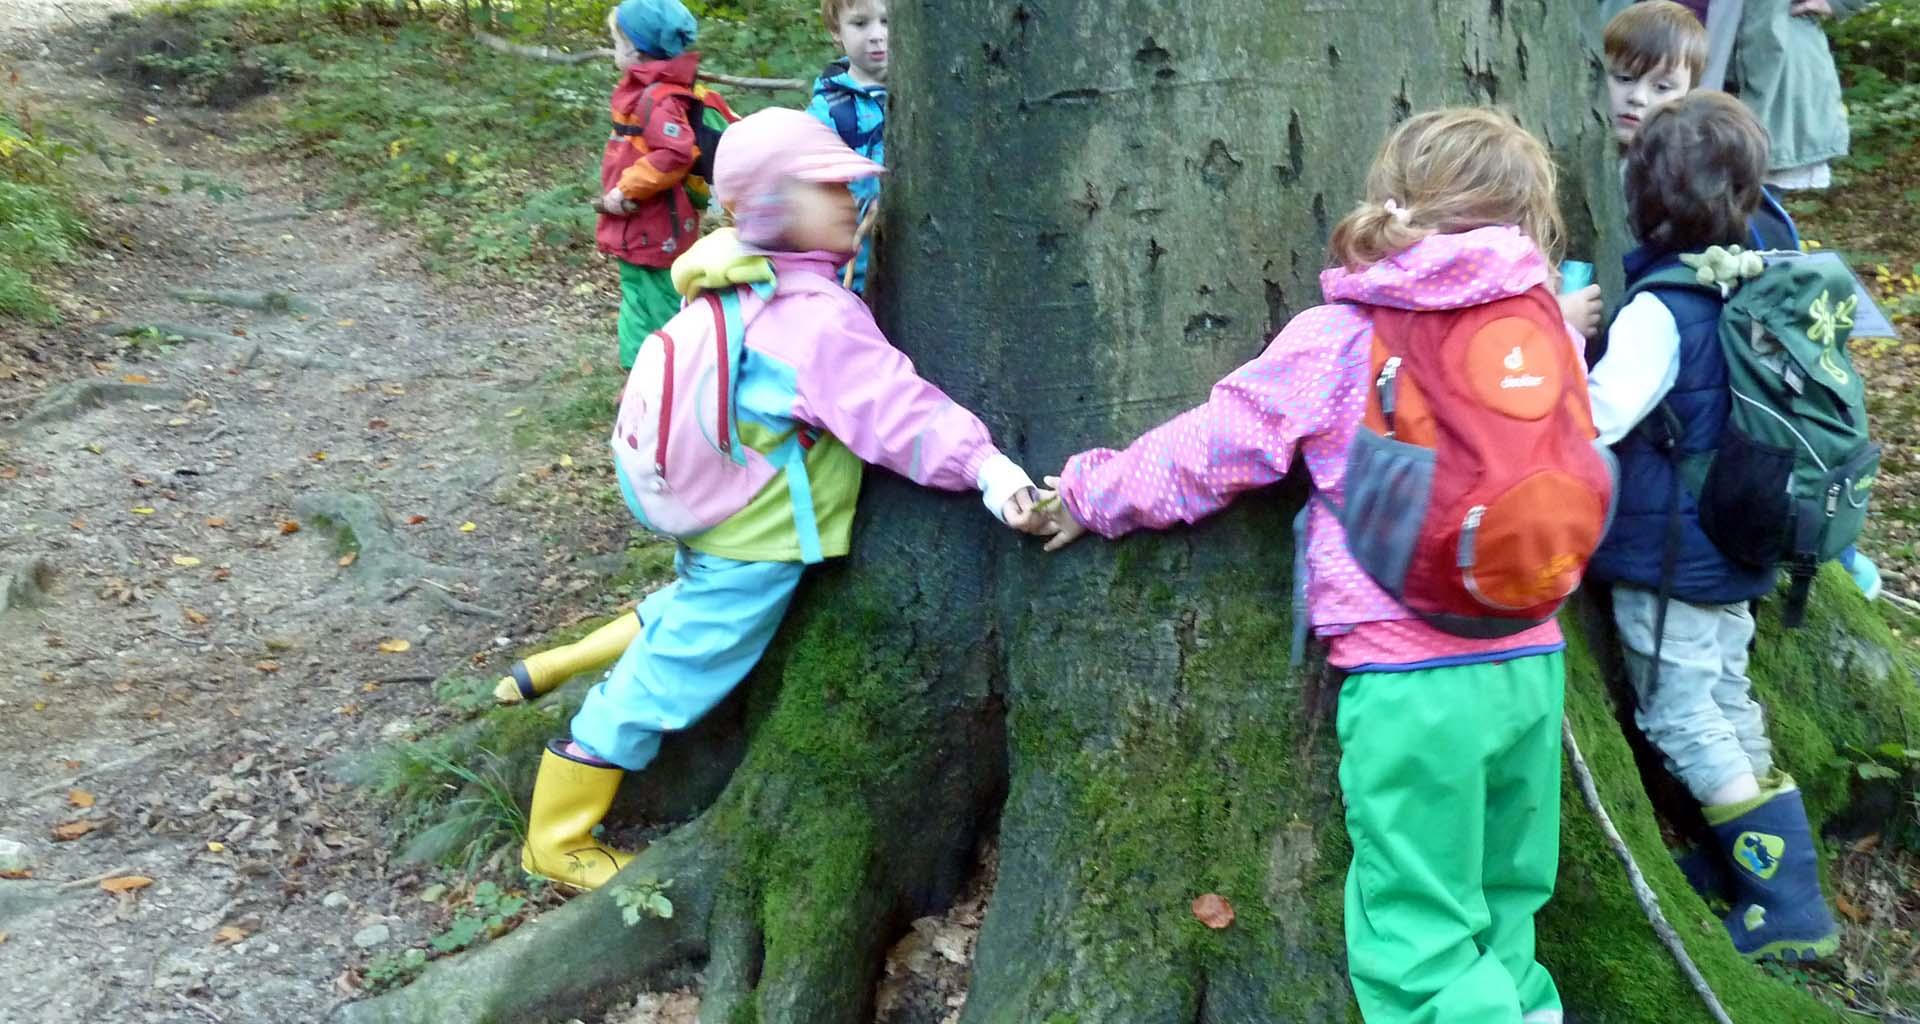 Matschpiraten|KinderumBaum|Seitenheader